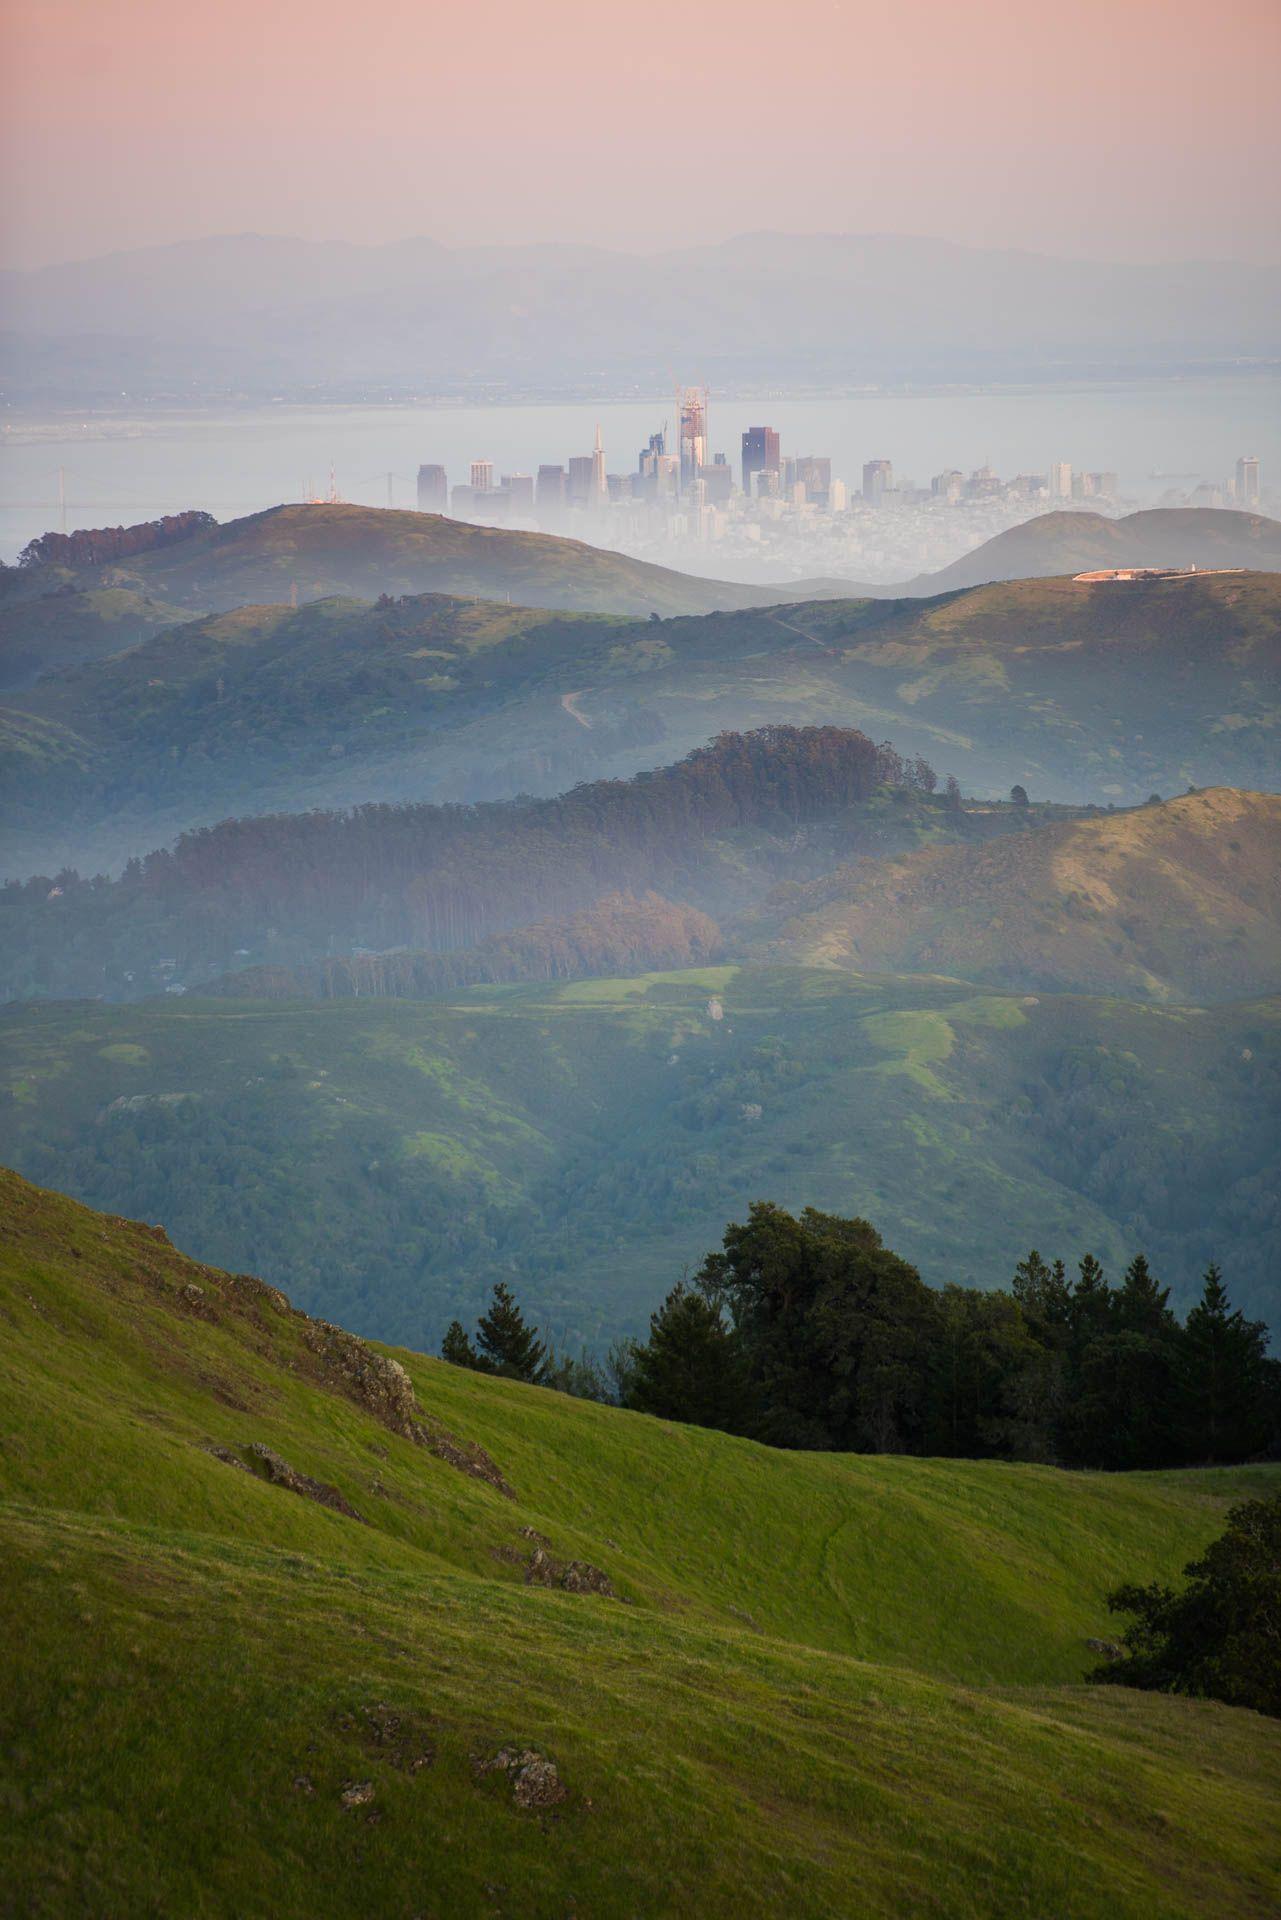 San Francisco CA from Mount Tamalpais. [OC][1281x1920]